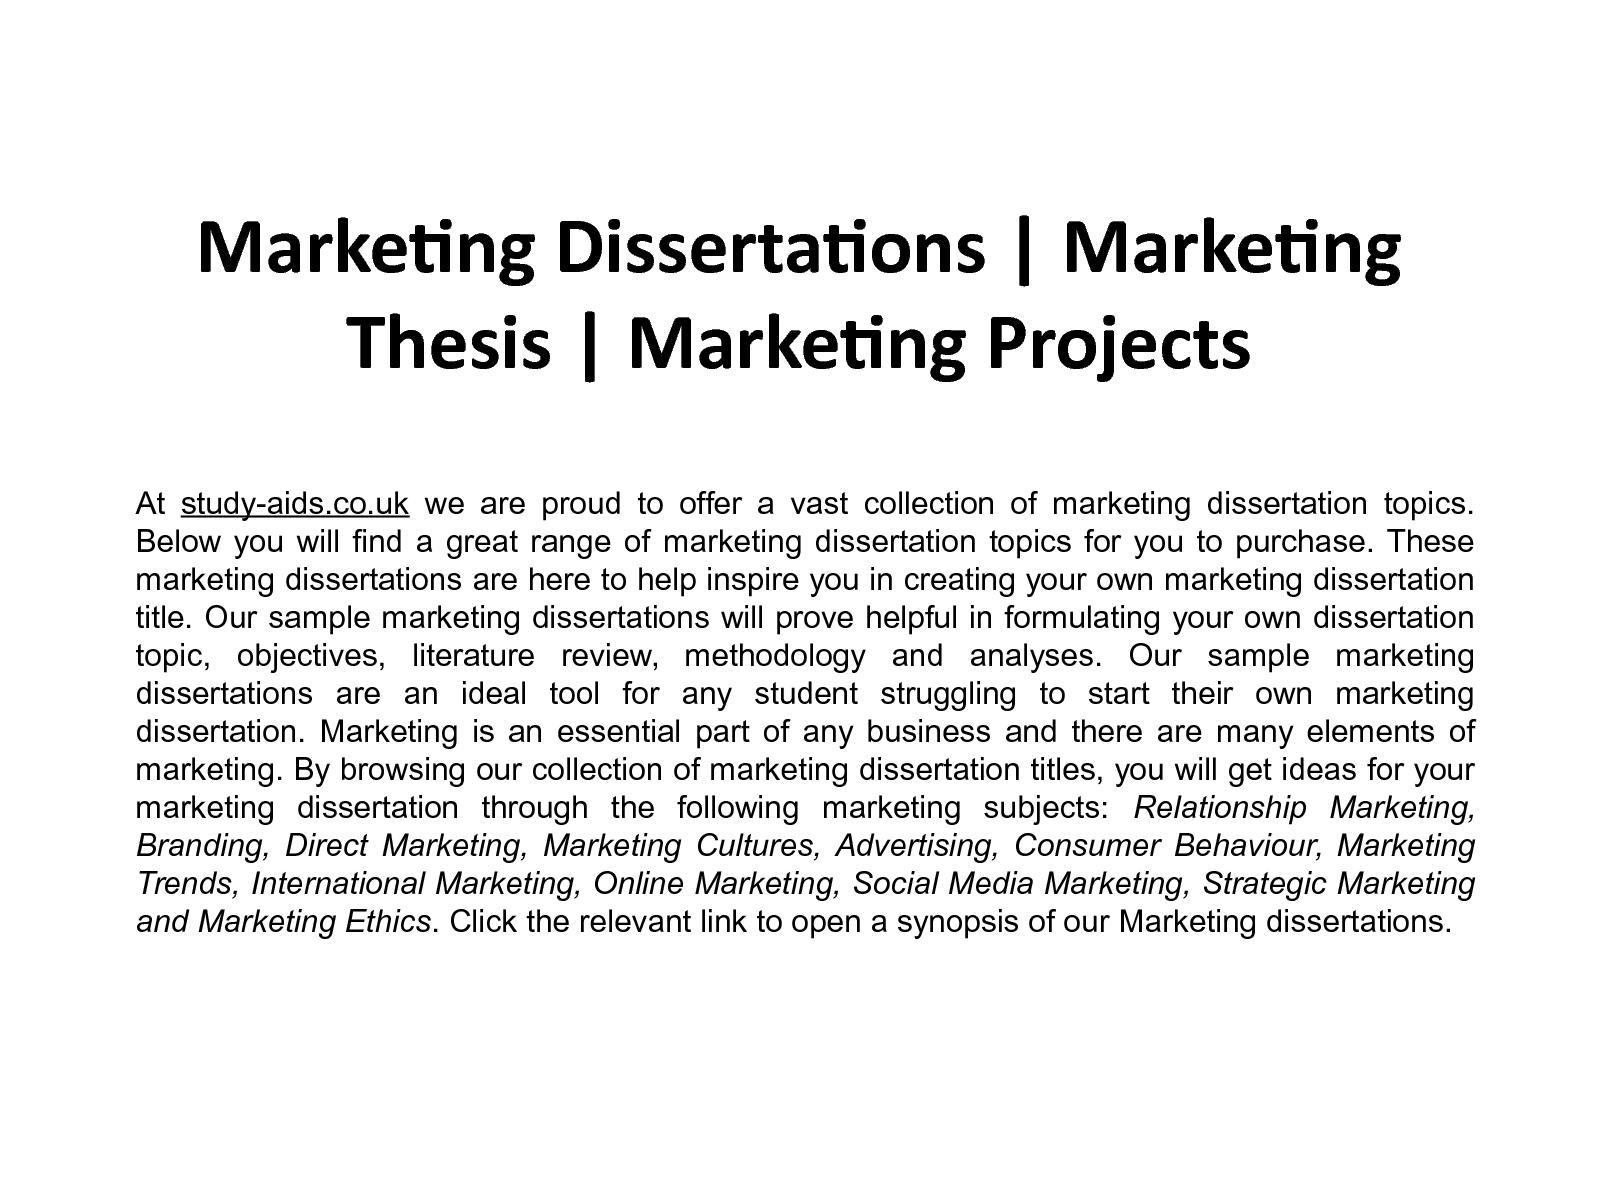 marketing dissertations